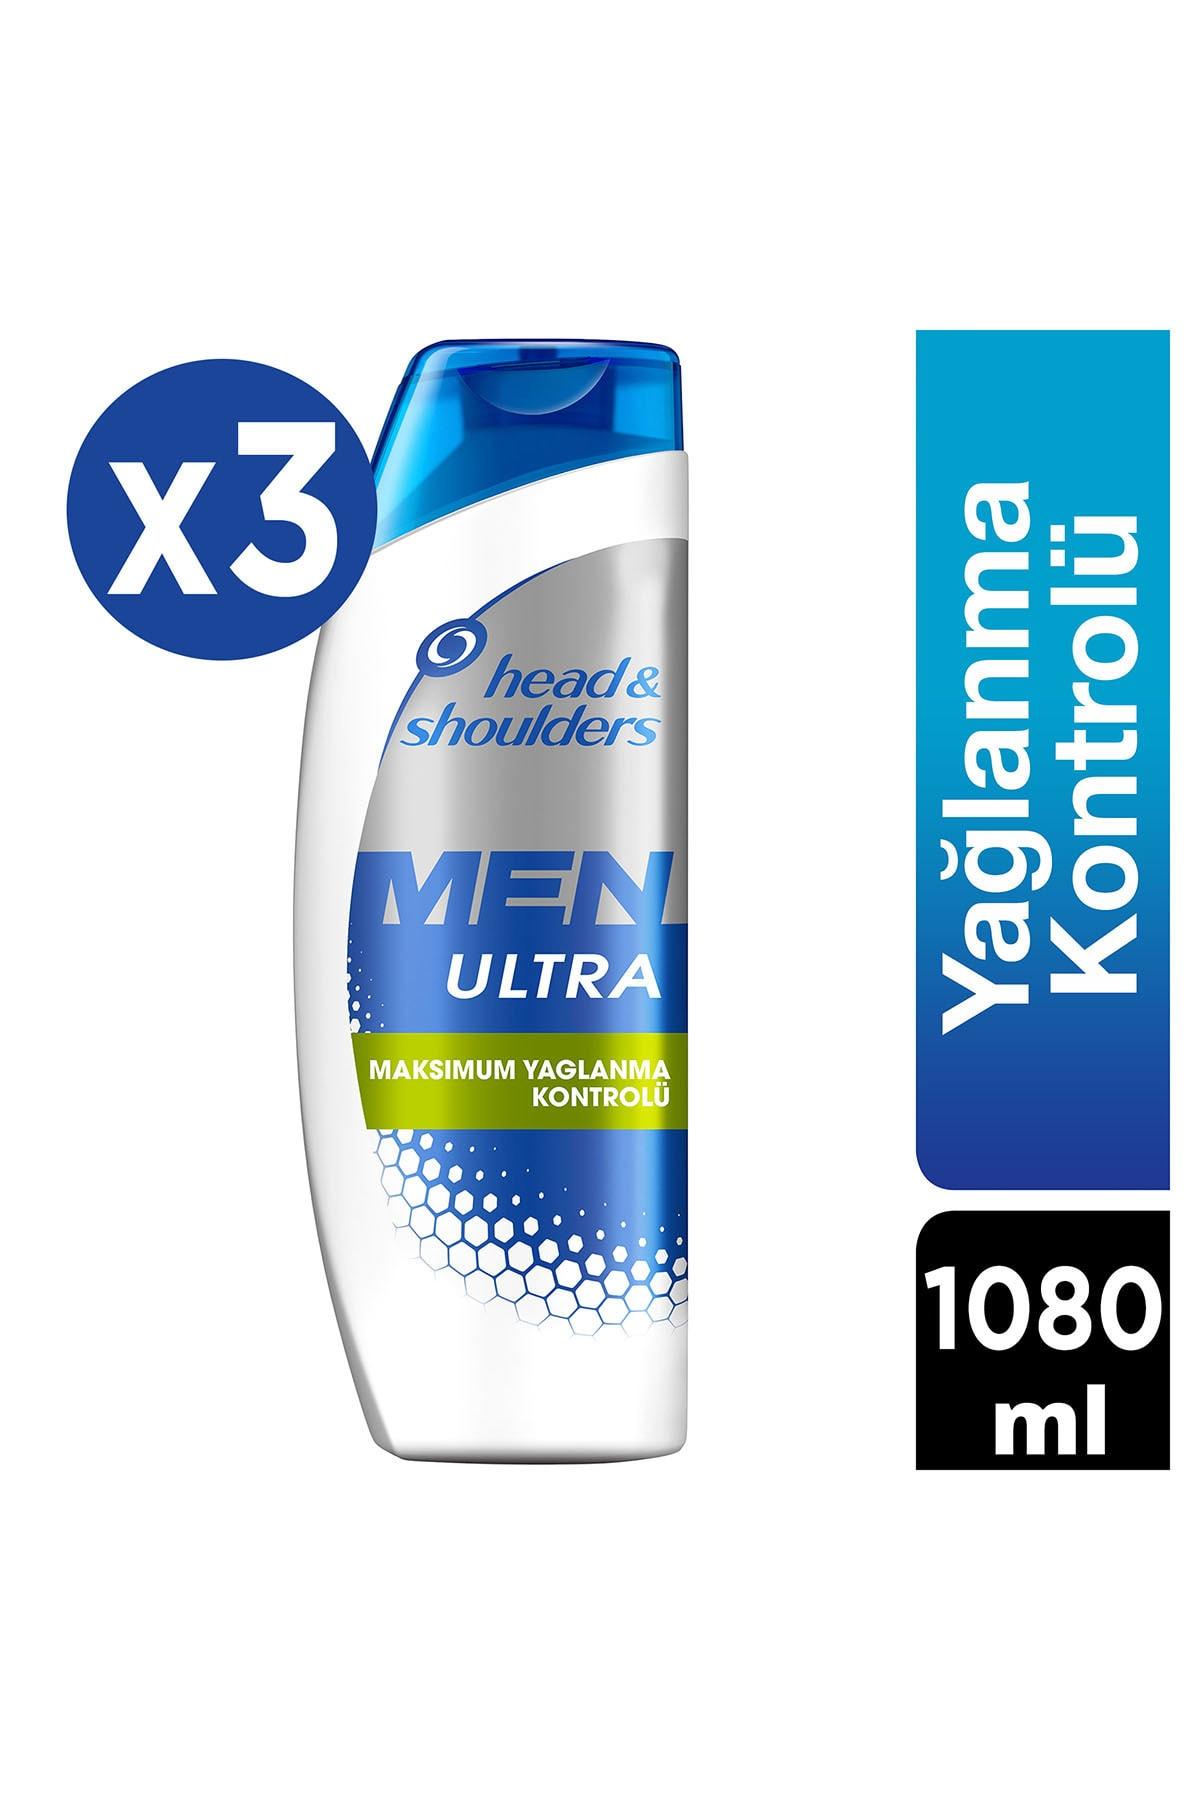 Head&Shoulders Men Ultra Erkeklere Özel Kepek Karşıtı Şampuan Maksimum Yağlanma Kontrolü 360 Ml X 3 1